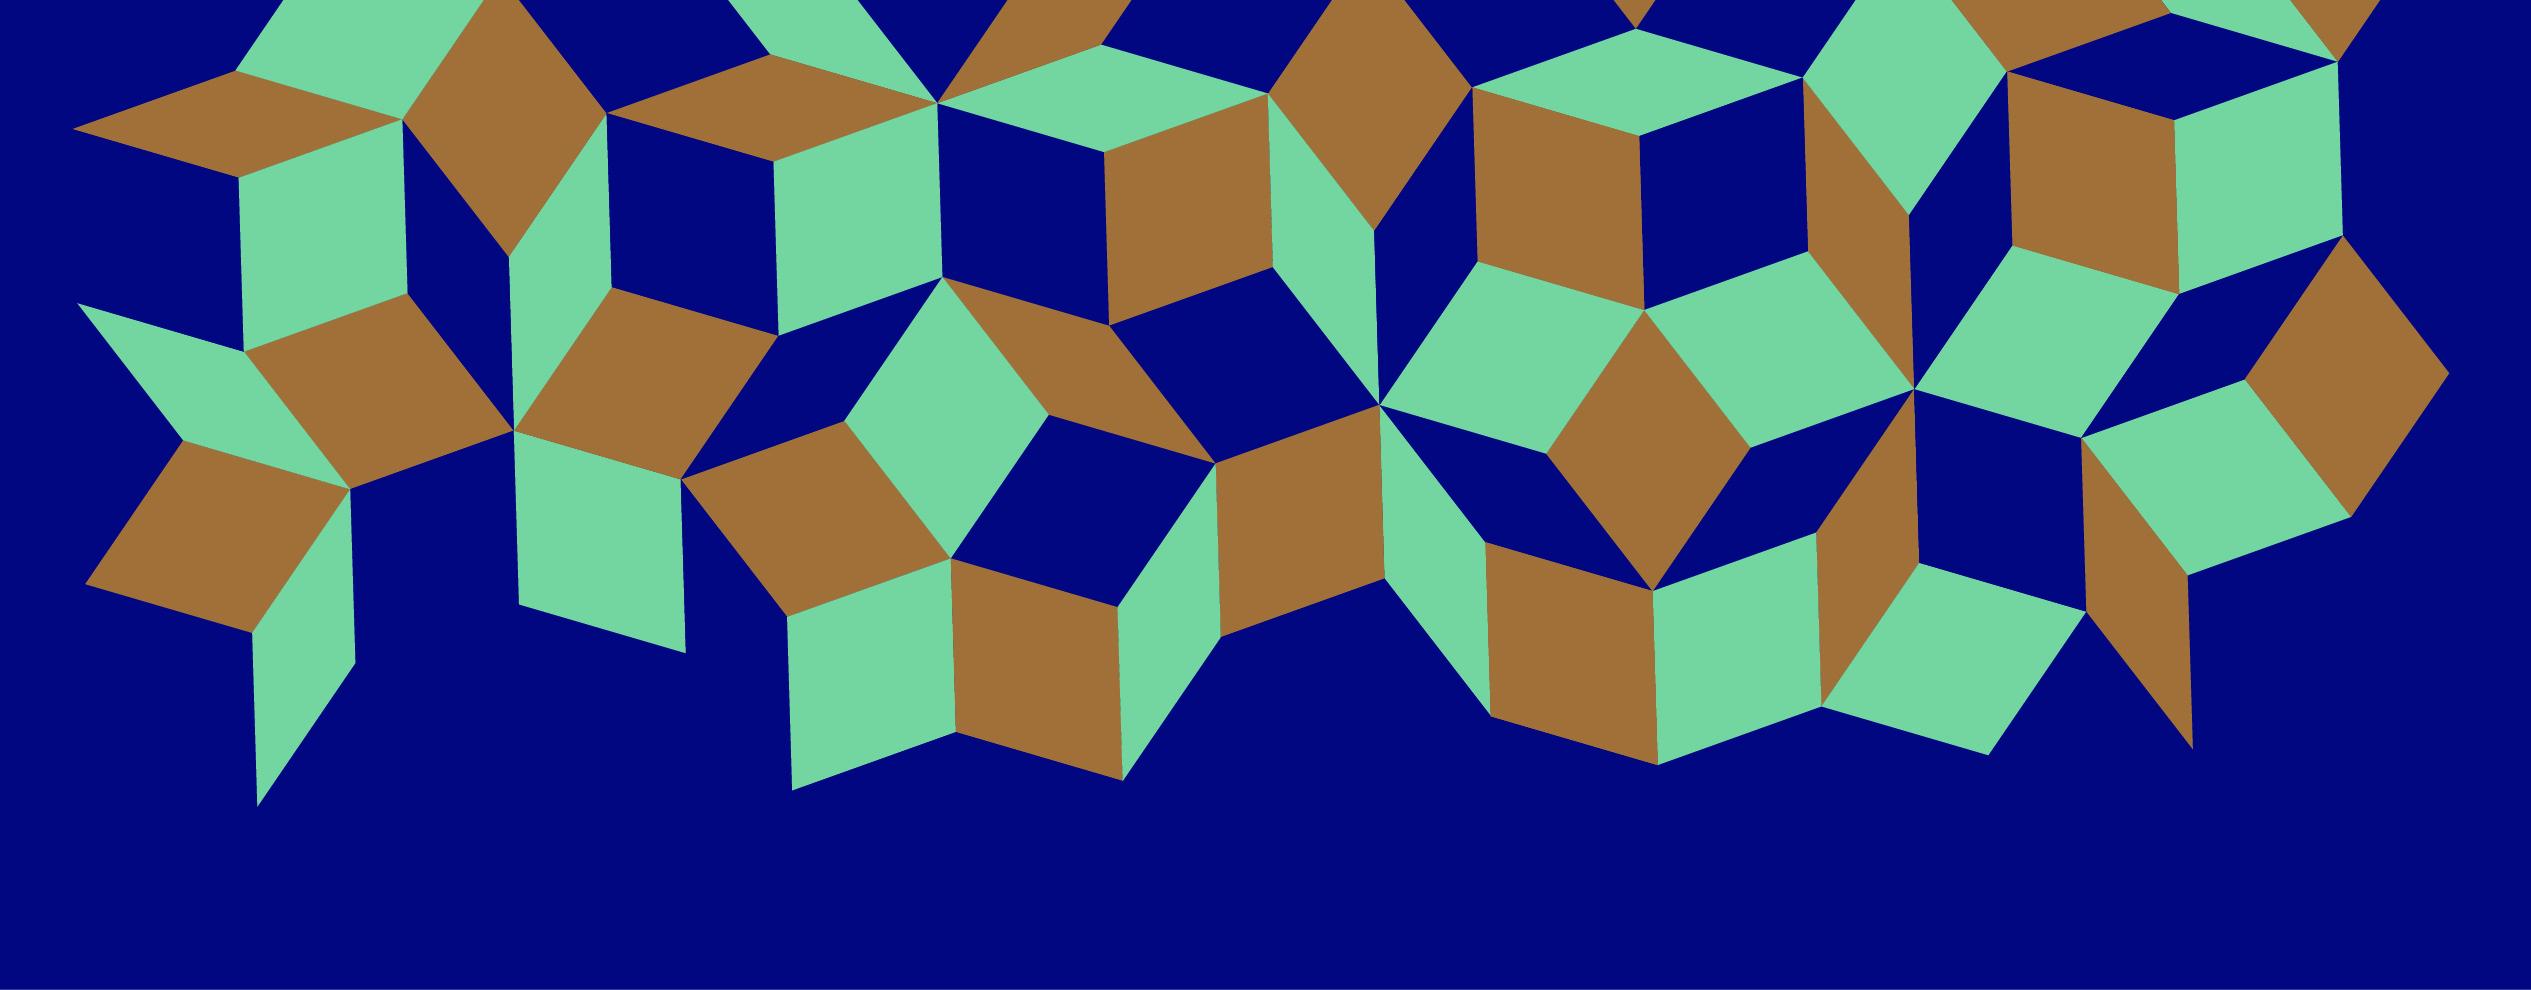 Penrose Law Team afbeelding